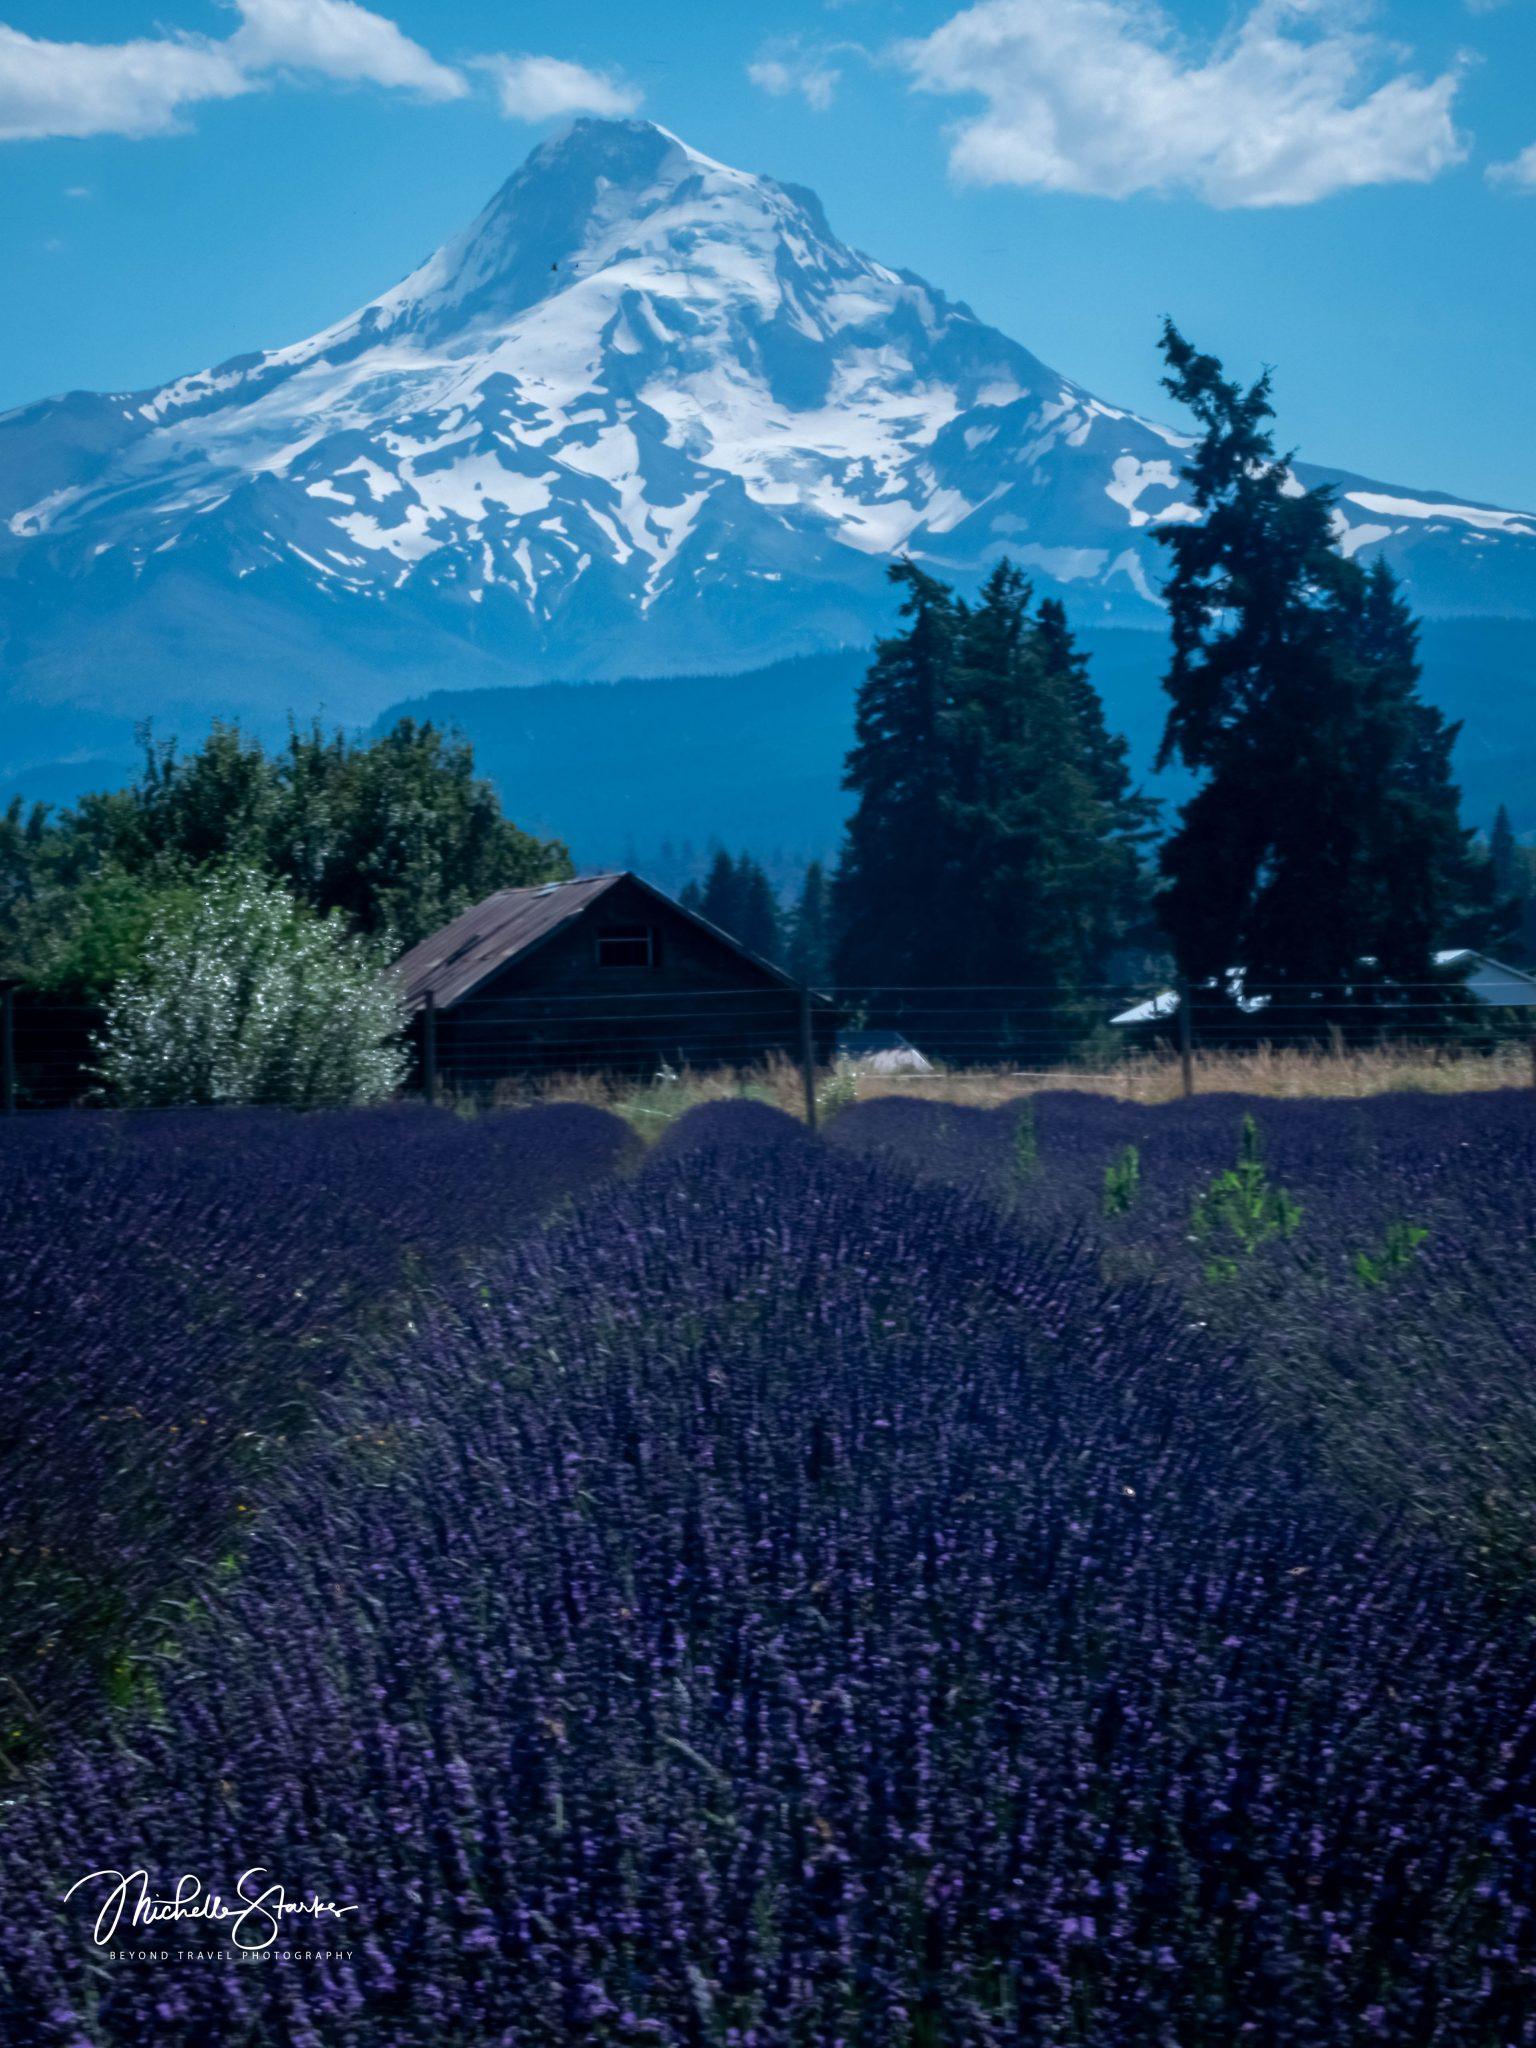 Lavender Farm near Mt. Hood, OR 7/19/20